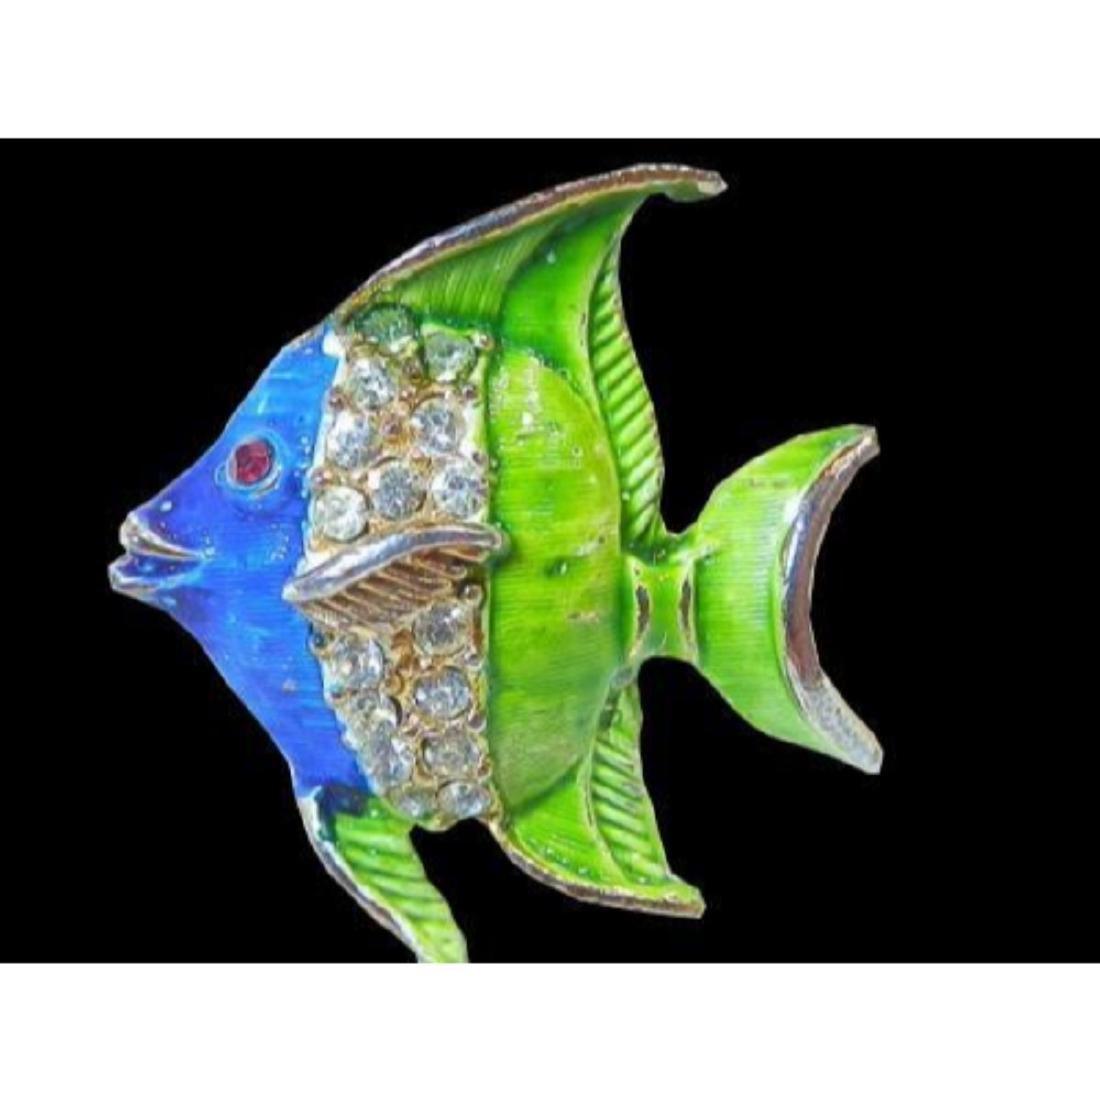 Vintage 1970's Blue & Green Enamel & Rhinestone Fish - 5